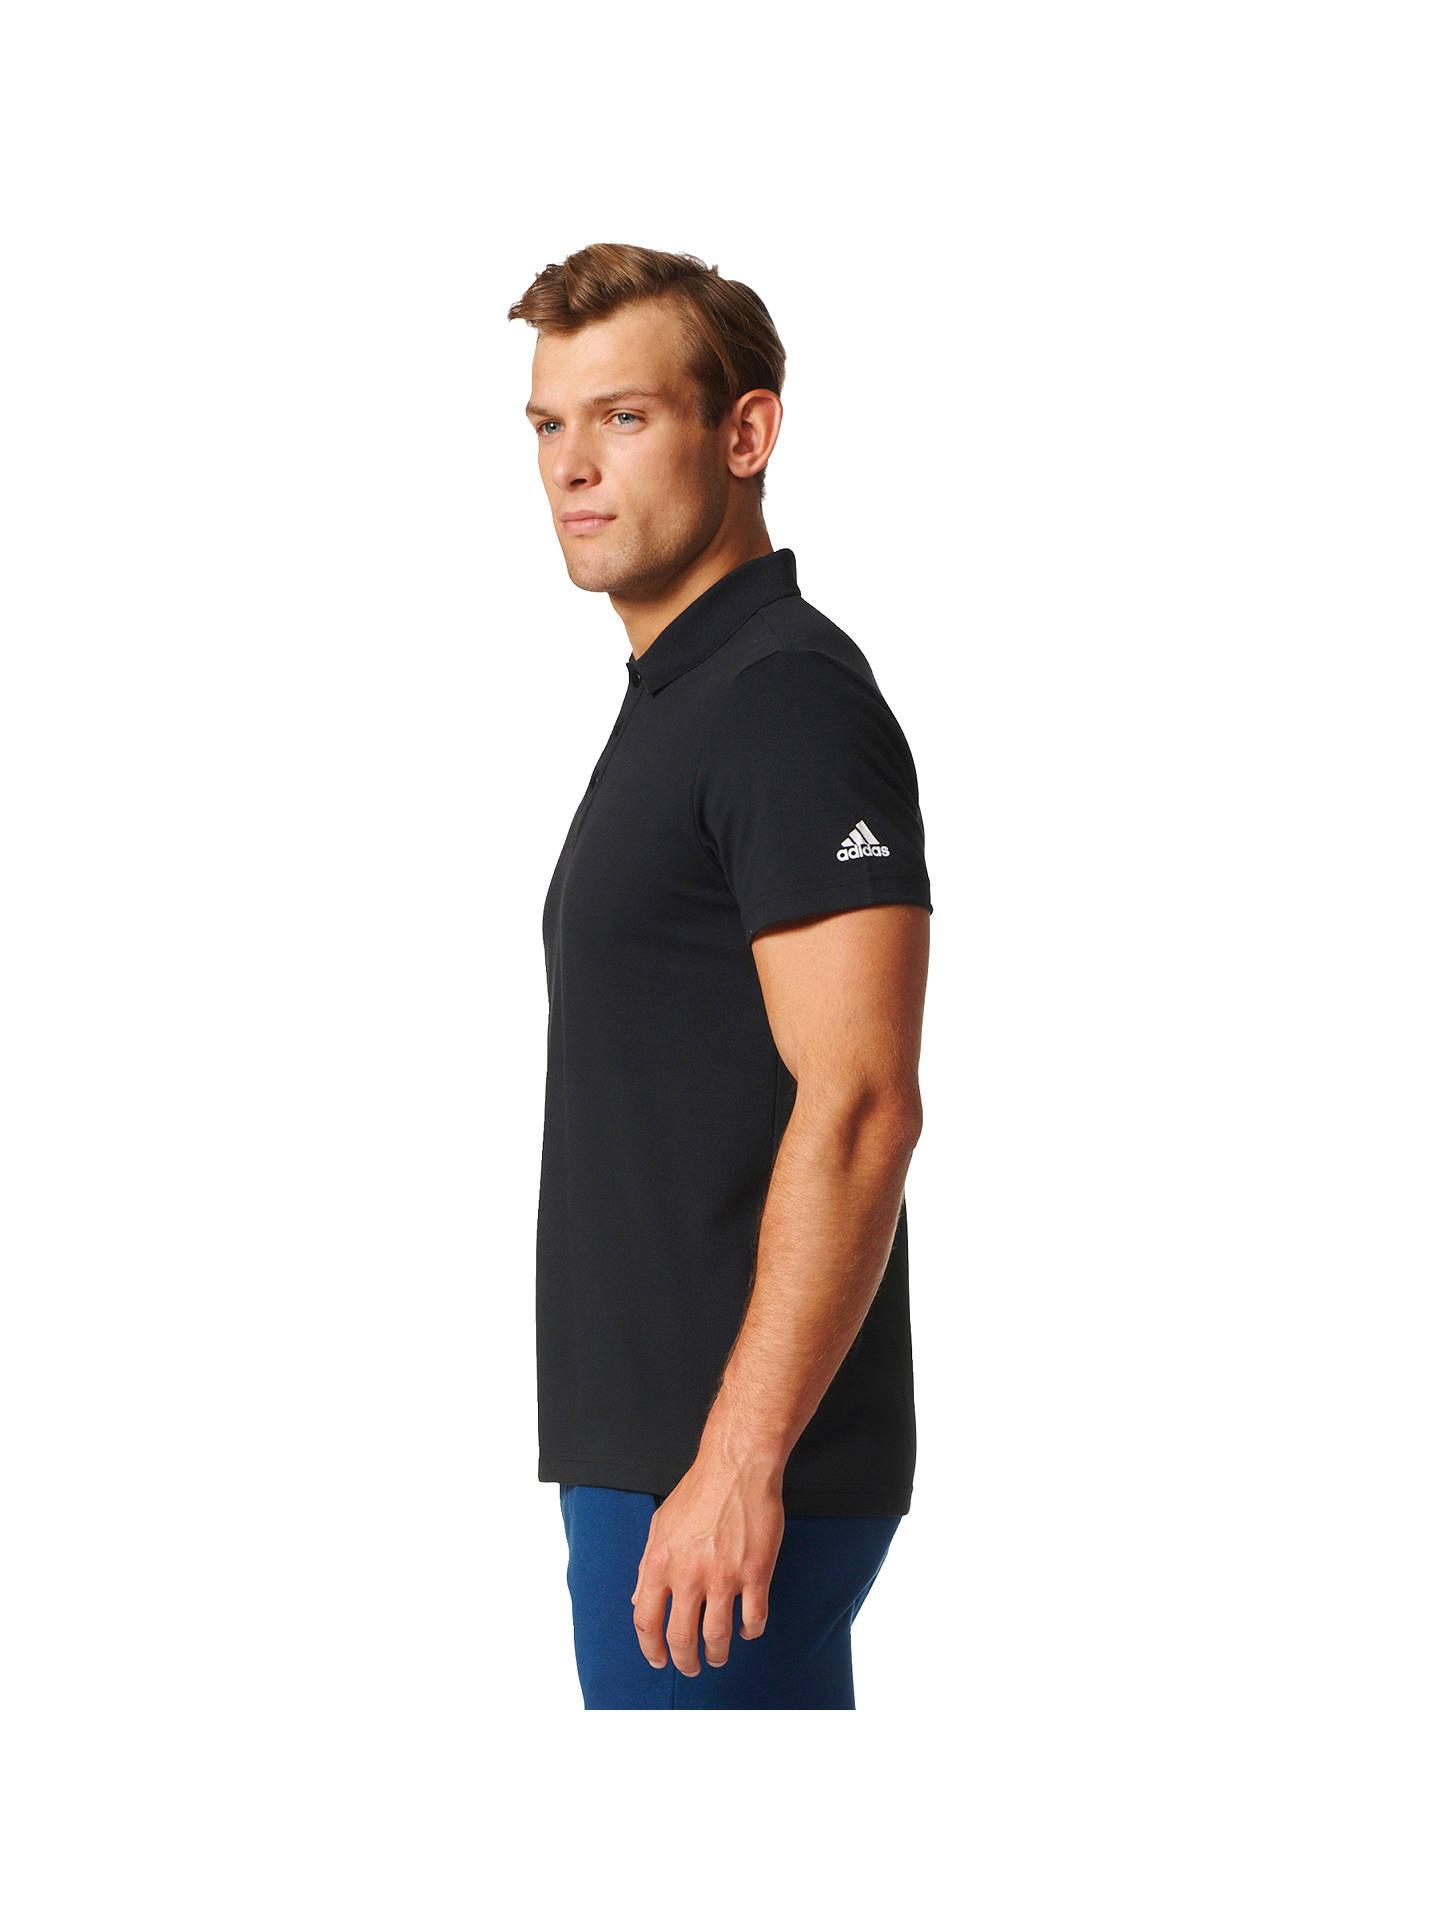 At Polo Training Base Lewis Partners amp; Shirt John Essential Adidas qaBKpc